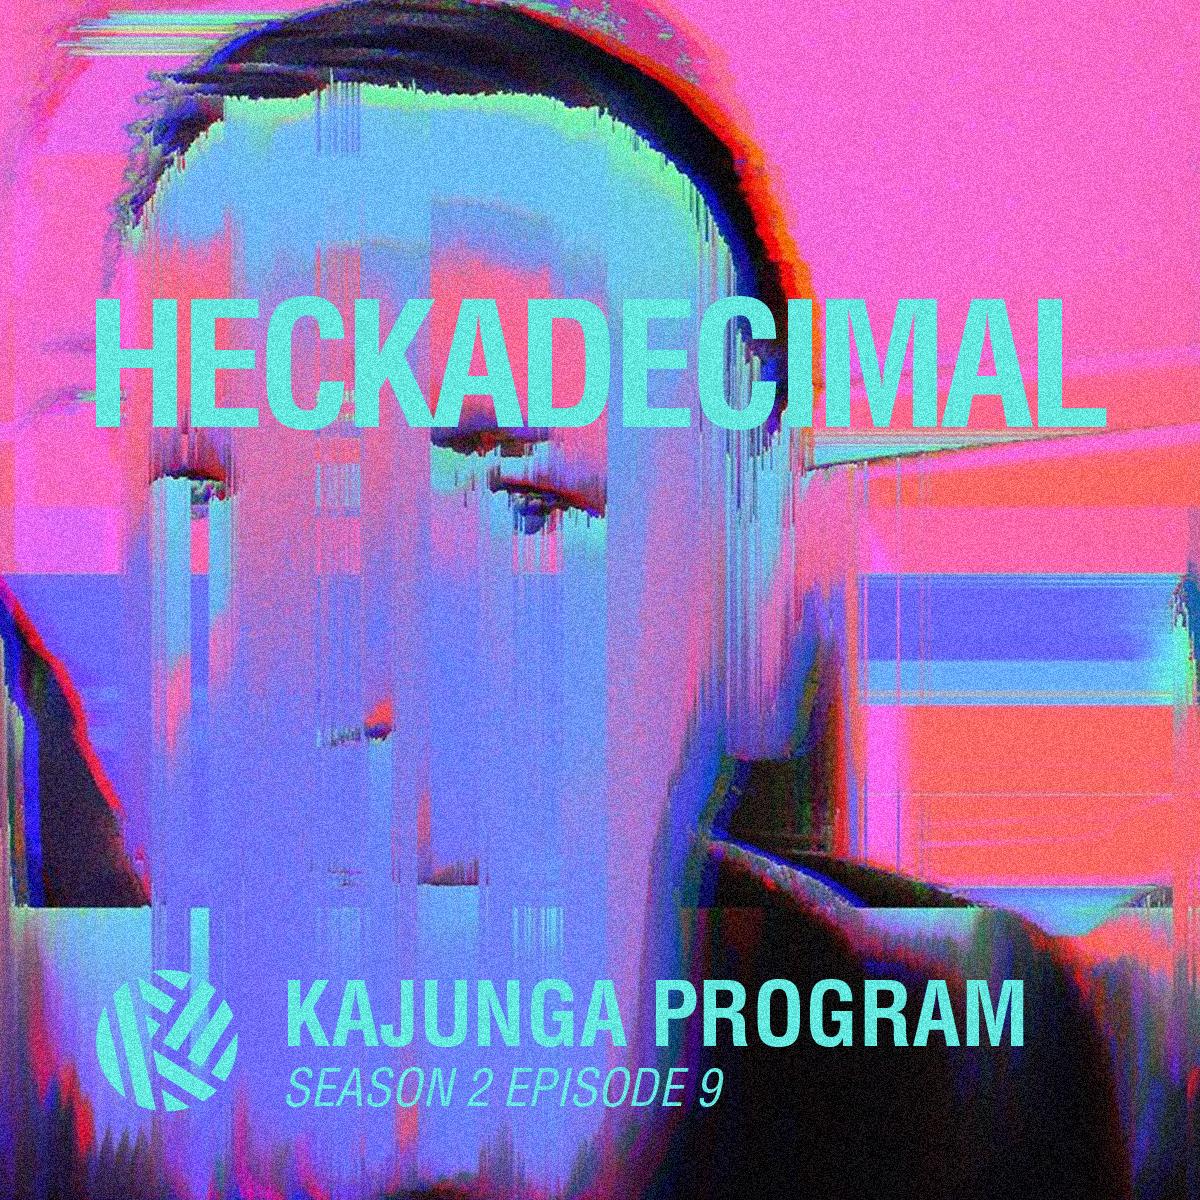 Kajunga_Program_Layout_Heckadecimal.jpg